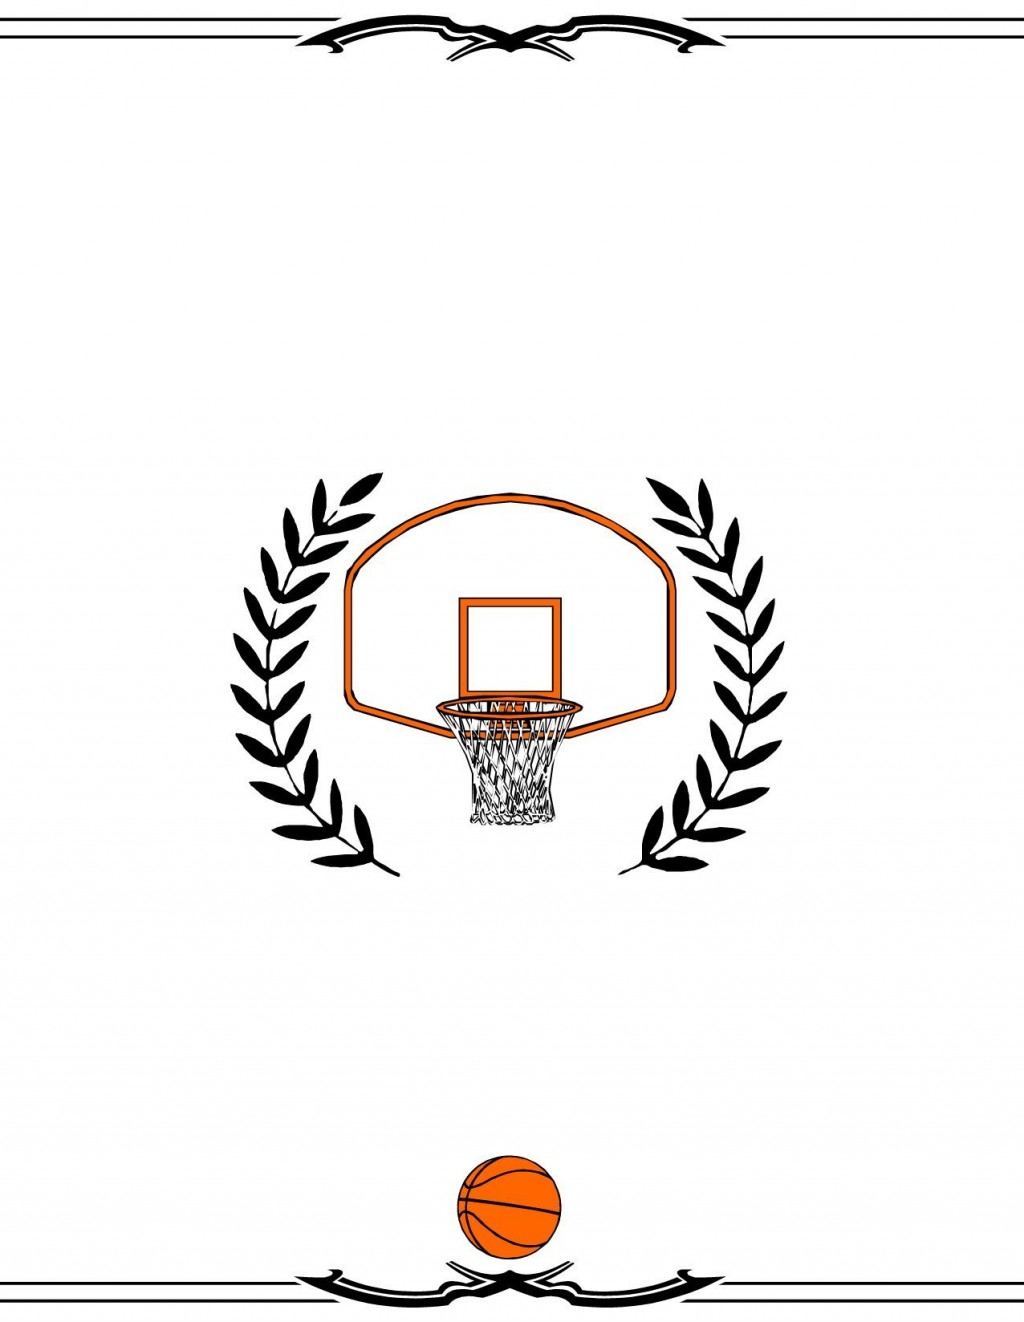 004 Astounding Free Printable Basketball Certificate Template Image  TemplatesLarge